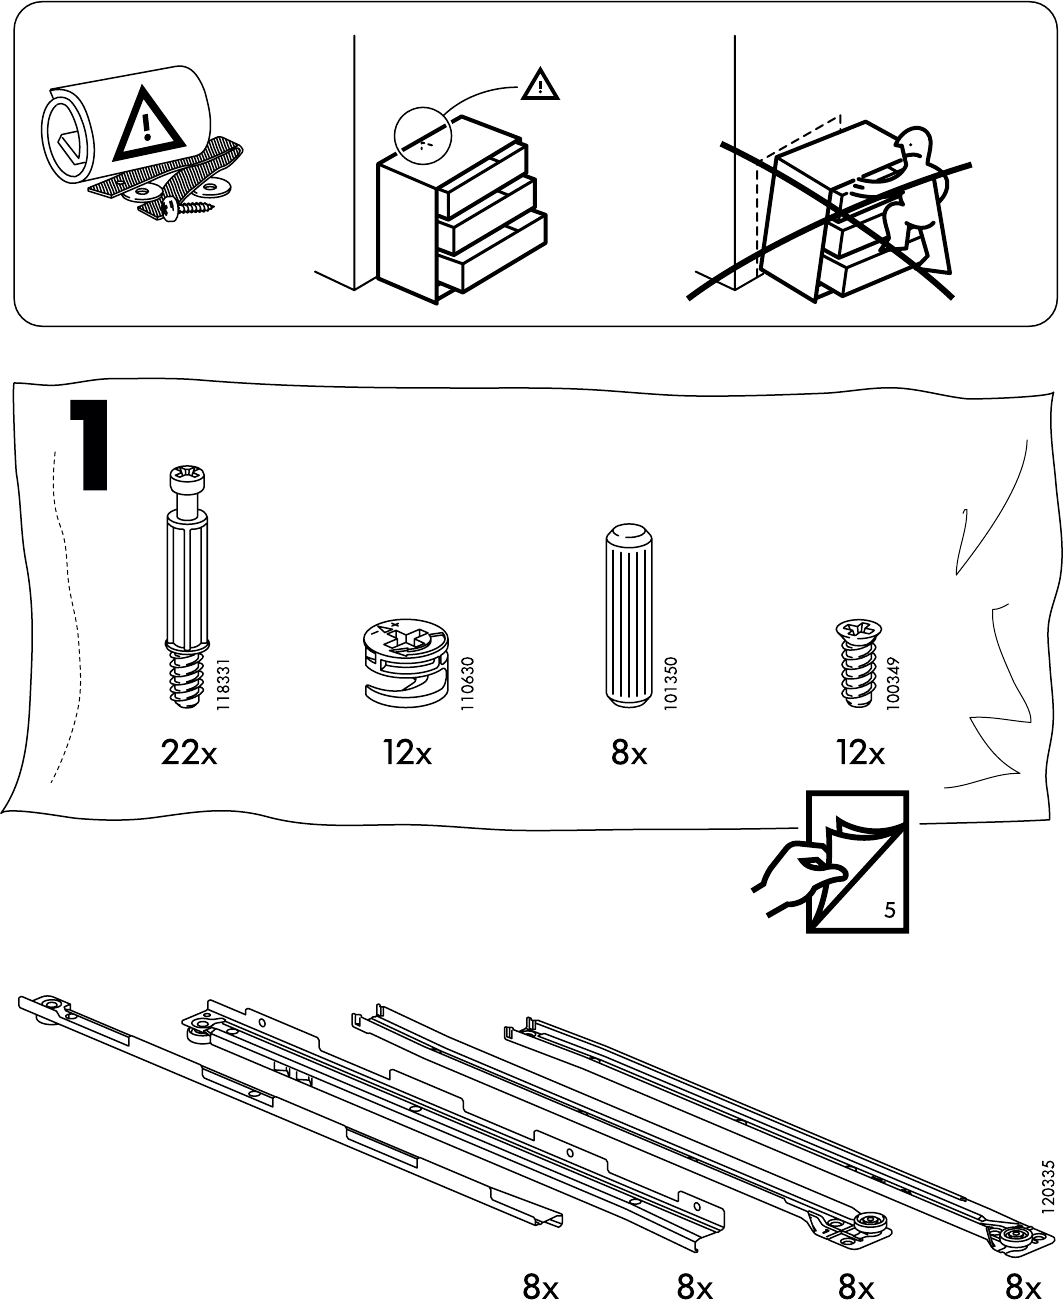 Ladekast 8 Lades.Handleiding Ikea Hemnes Ladekast 8 Lades Pagina 3 Van 32 Dansk